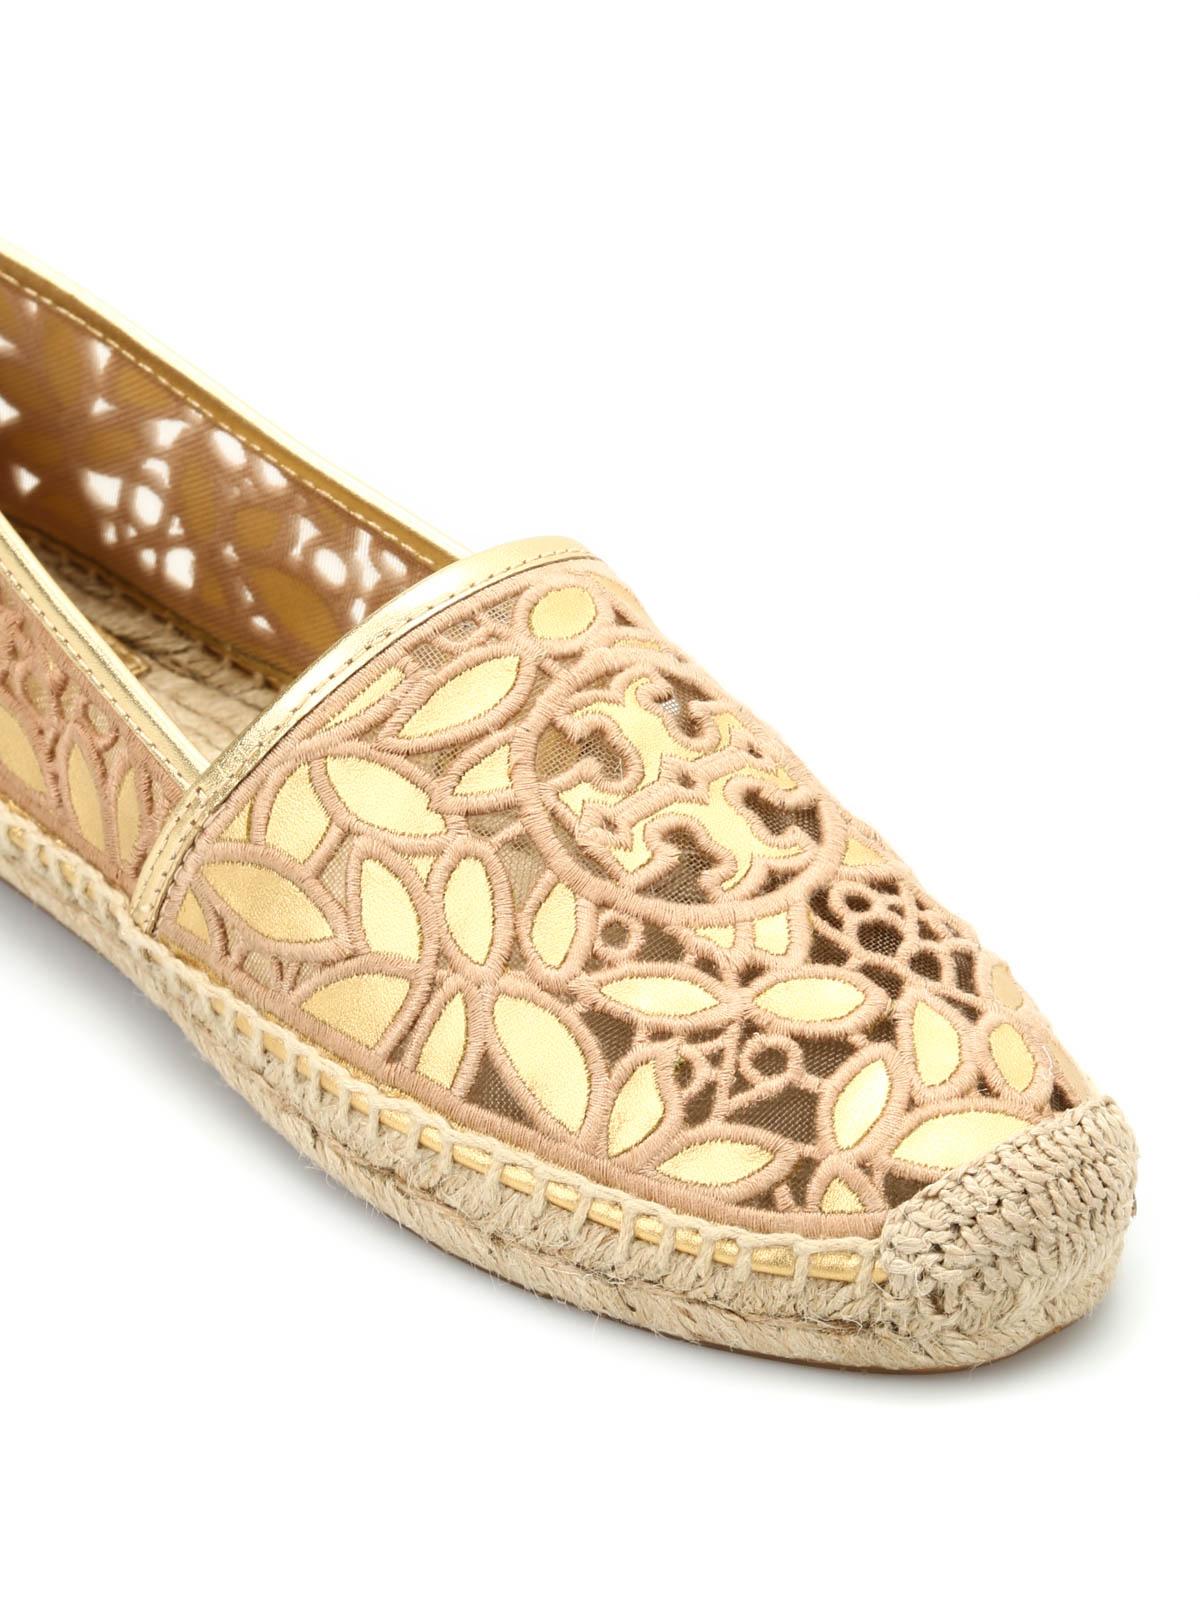 59f051cf017 Tory Burch - Rhea floral pattern espadrilles - espadrilles ...